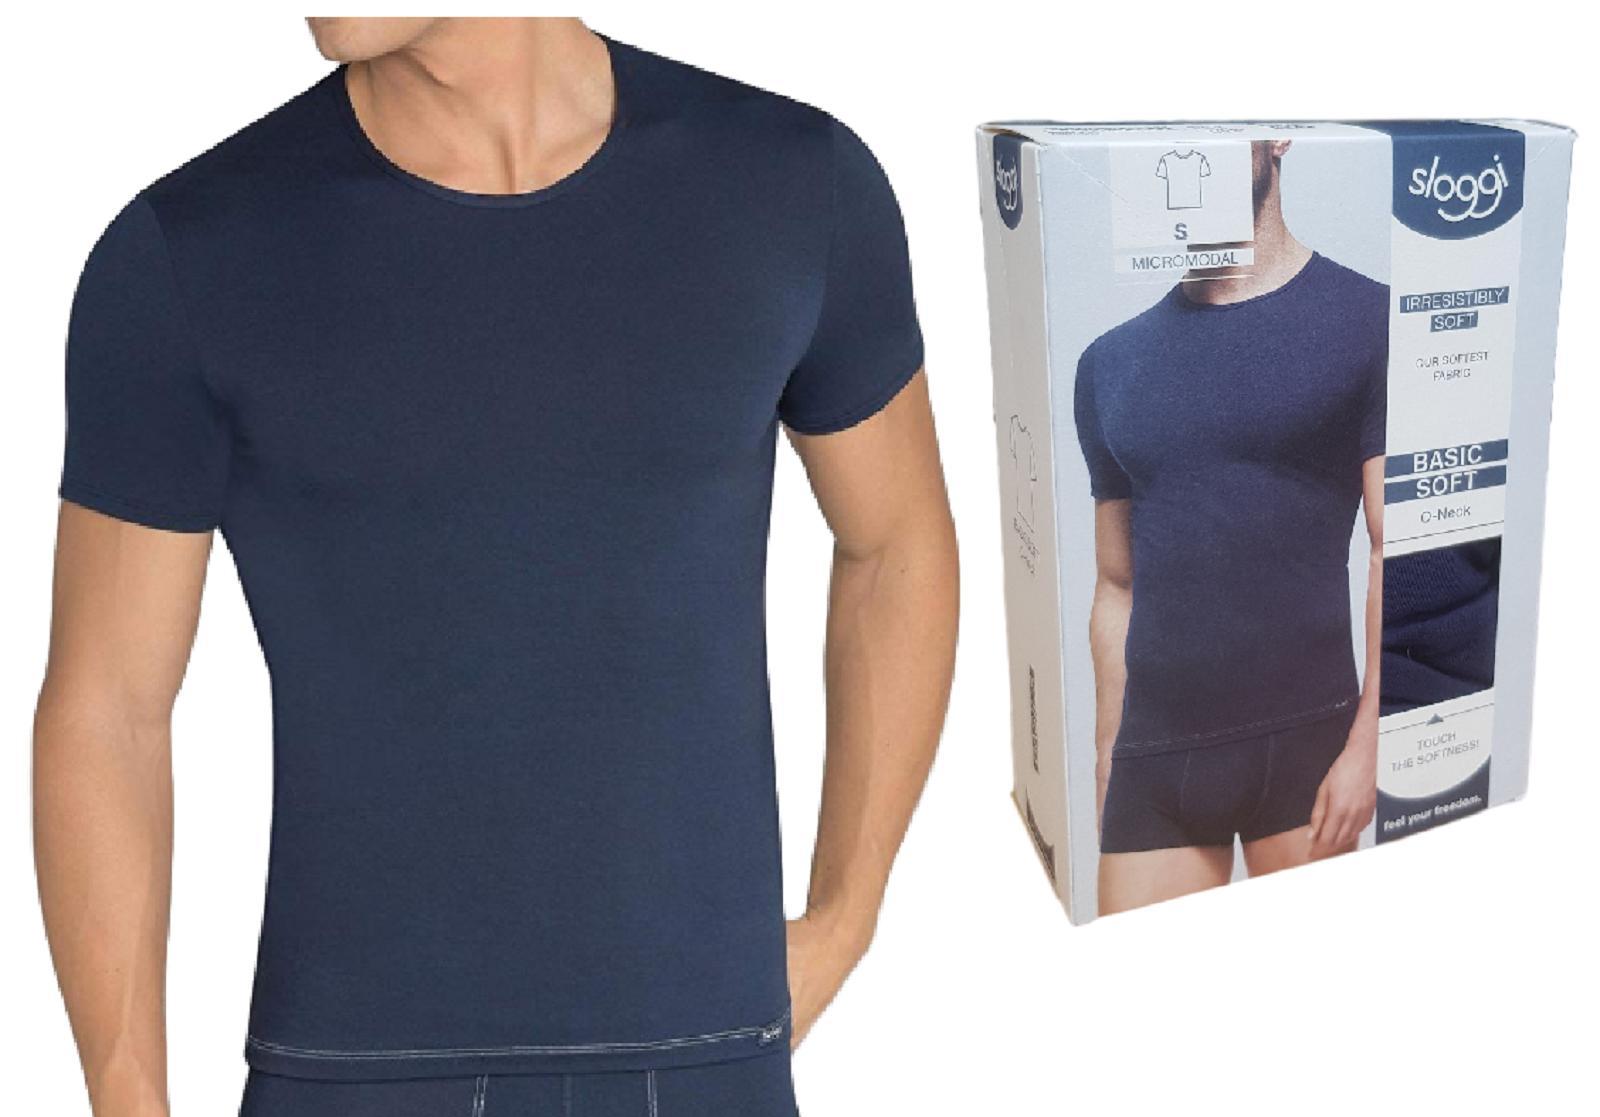 T-Shirt uomo maglietta manica corta girocollo Micromodal BASIC SOFT ONECK SLOGGI